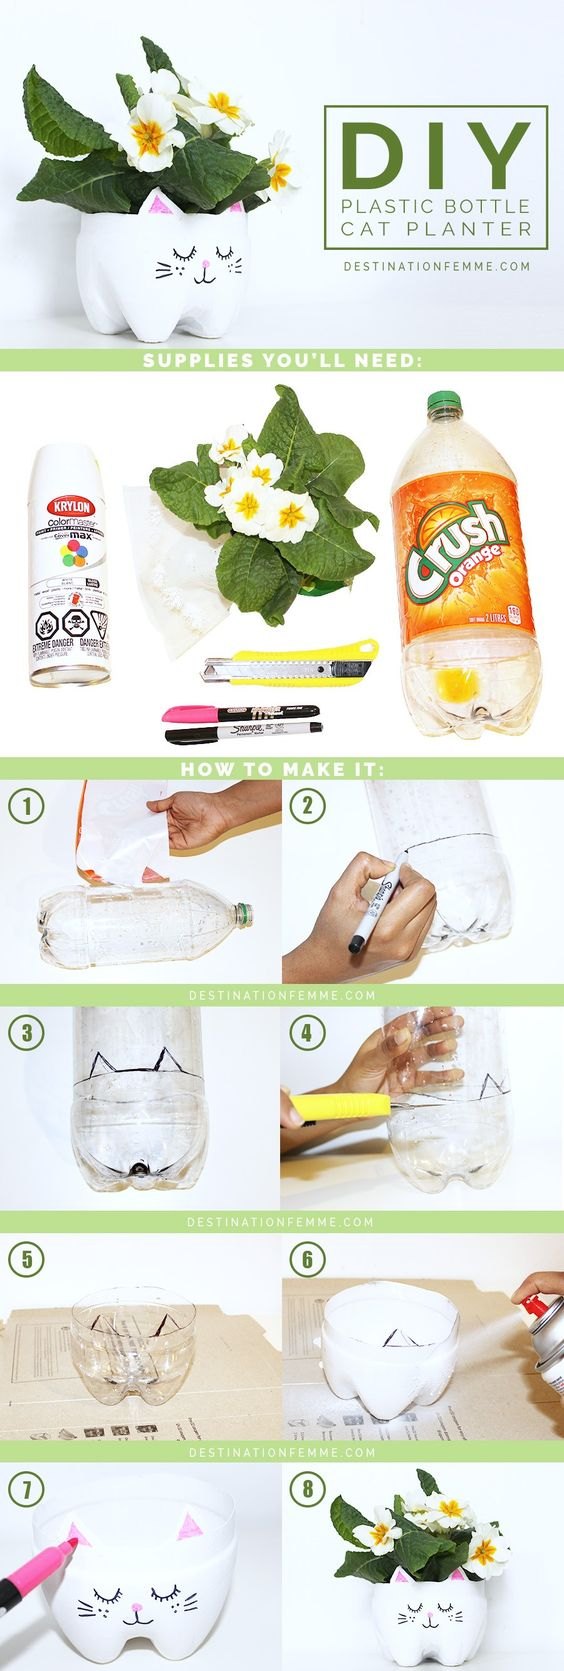 DIY Kitty Cat Planter From A Soda Bottle - Imgur